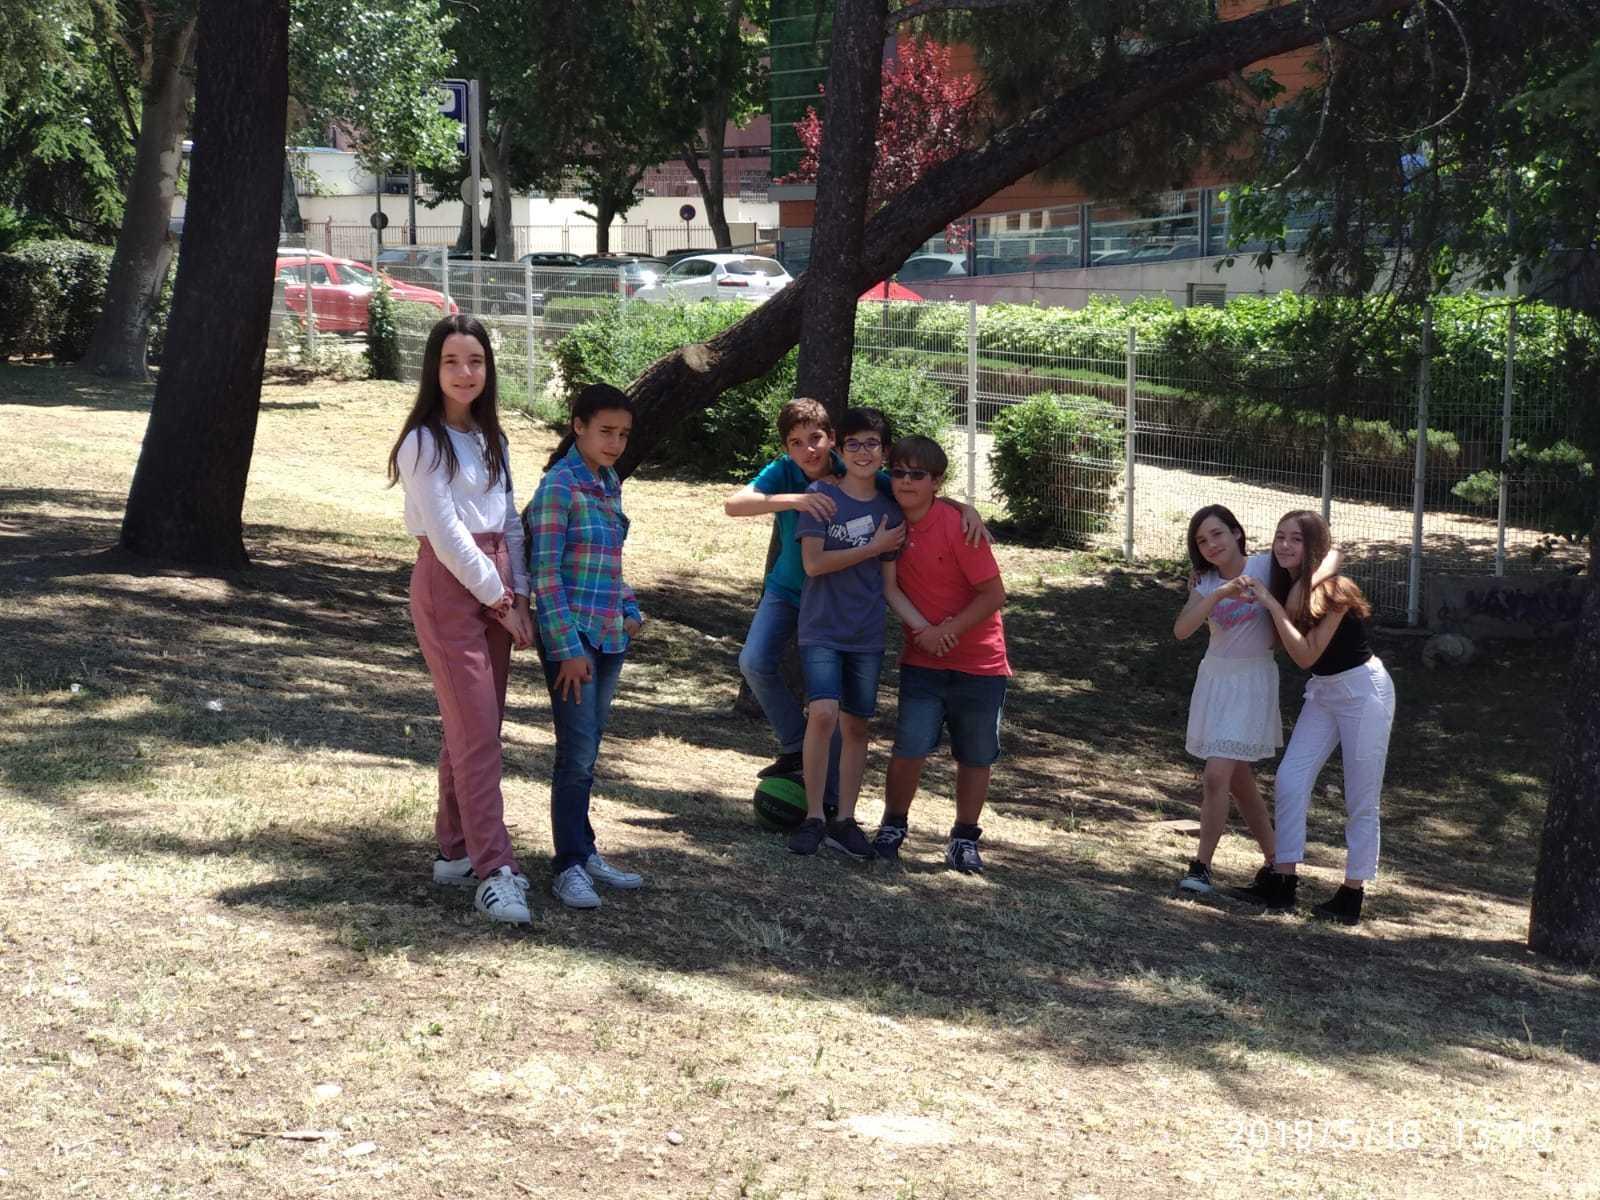 2019_05_16_oratoria_imágenes_CEIP FDLR_Las Rozas 4